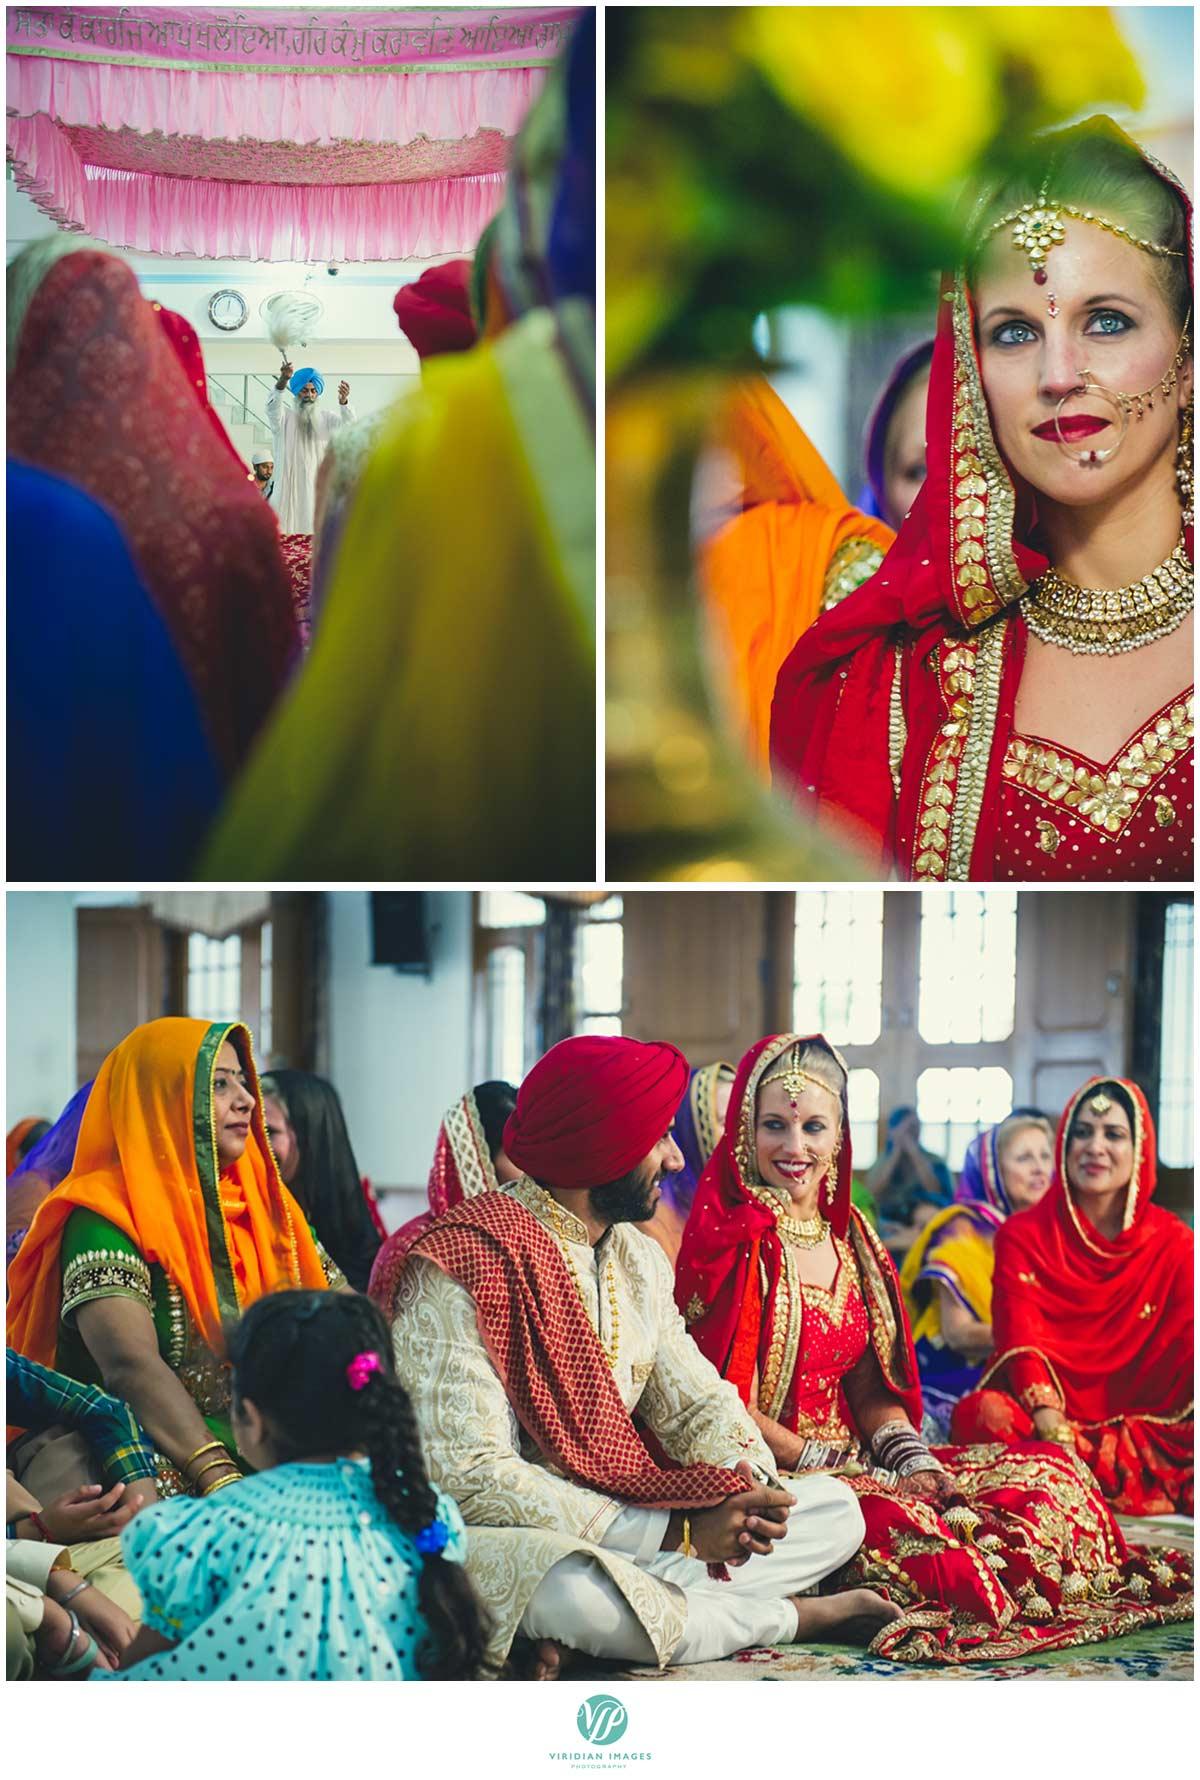 India_Chandigarh_Wedding_Viridian_Images_Photography_poto_21